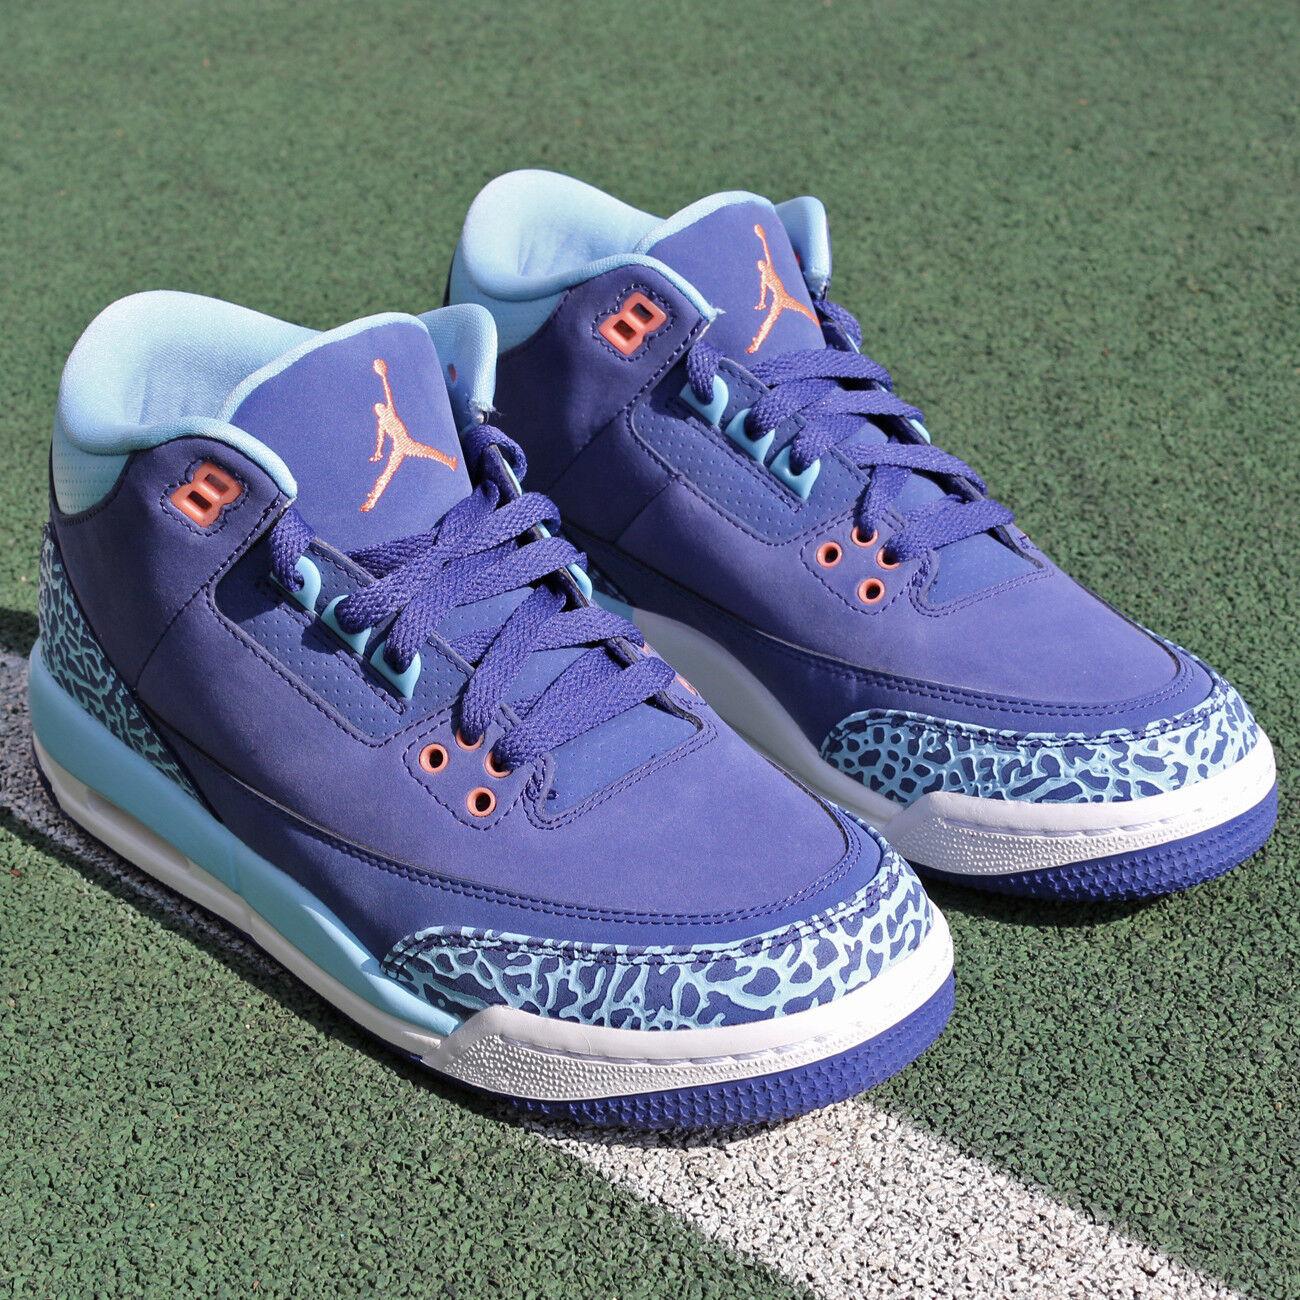 Air Jordan 3 3 3 GG 441140-506 Purple Dust Pink Blau Weiß Damens Girls Kids Youth GS ba370d